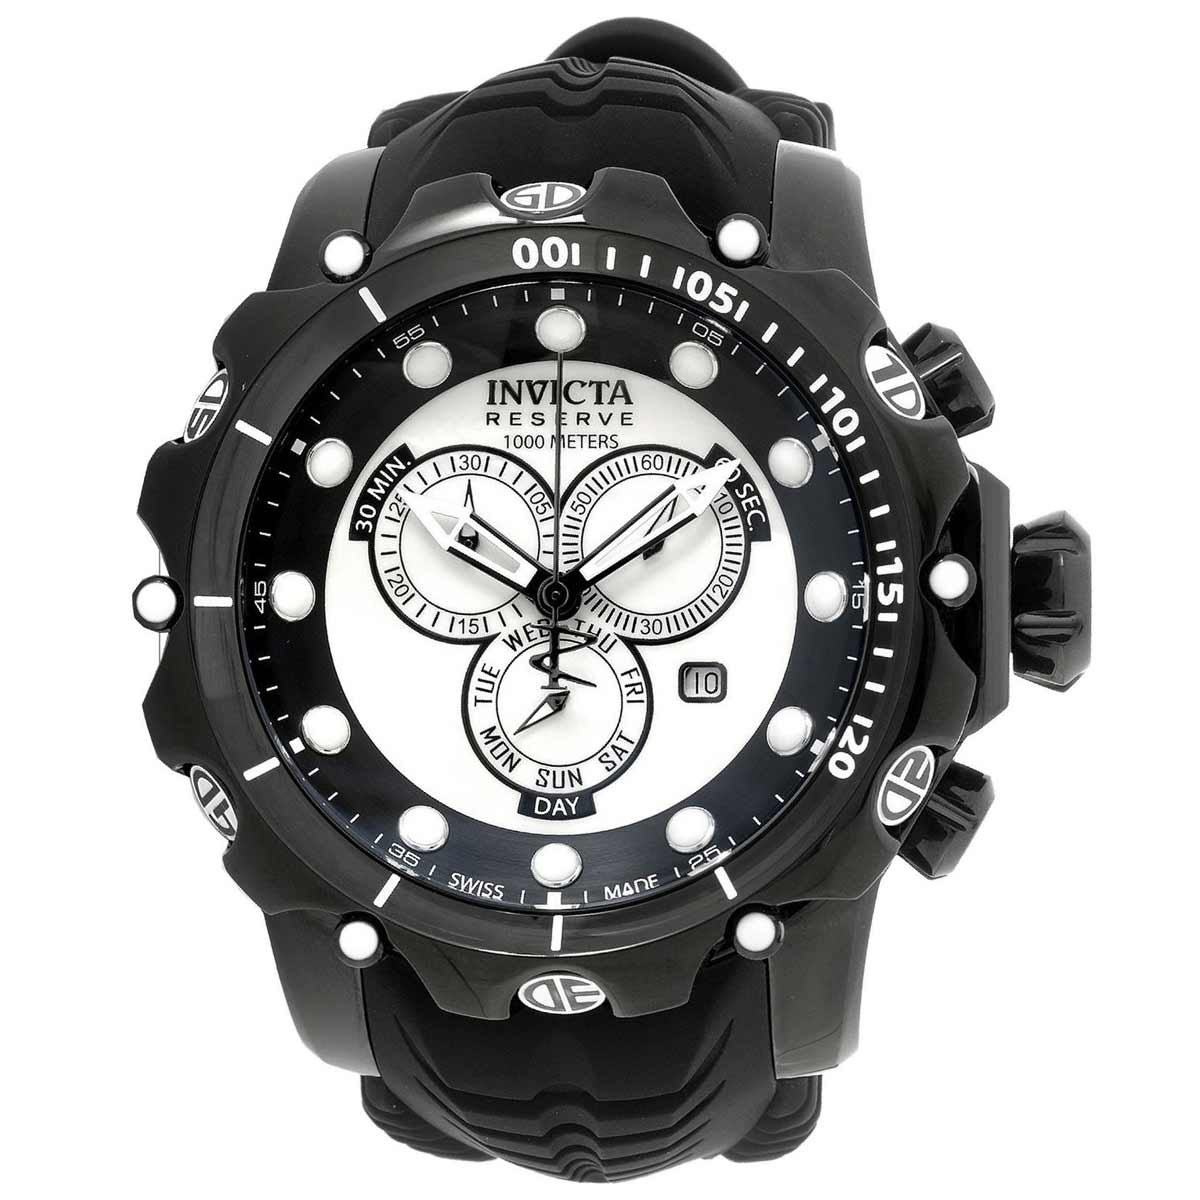 Invicta Men s Venom Swiss Quartz Stainless Steel and Silicone Watch, Color Black Model 20398